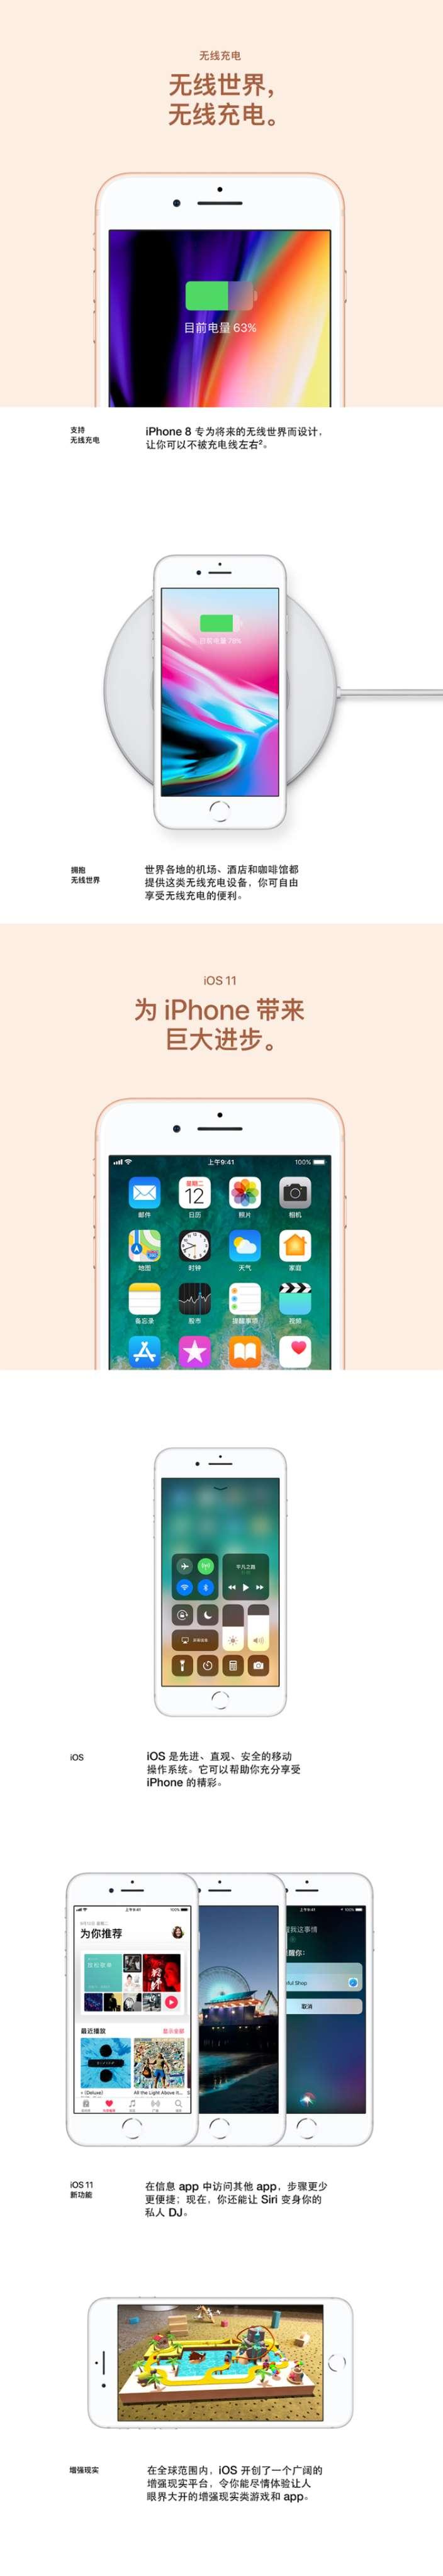 iPhone8pic6.jpg